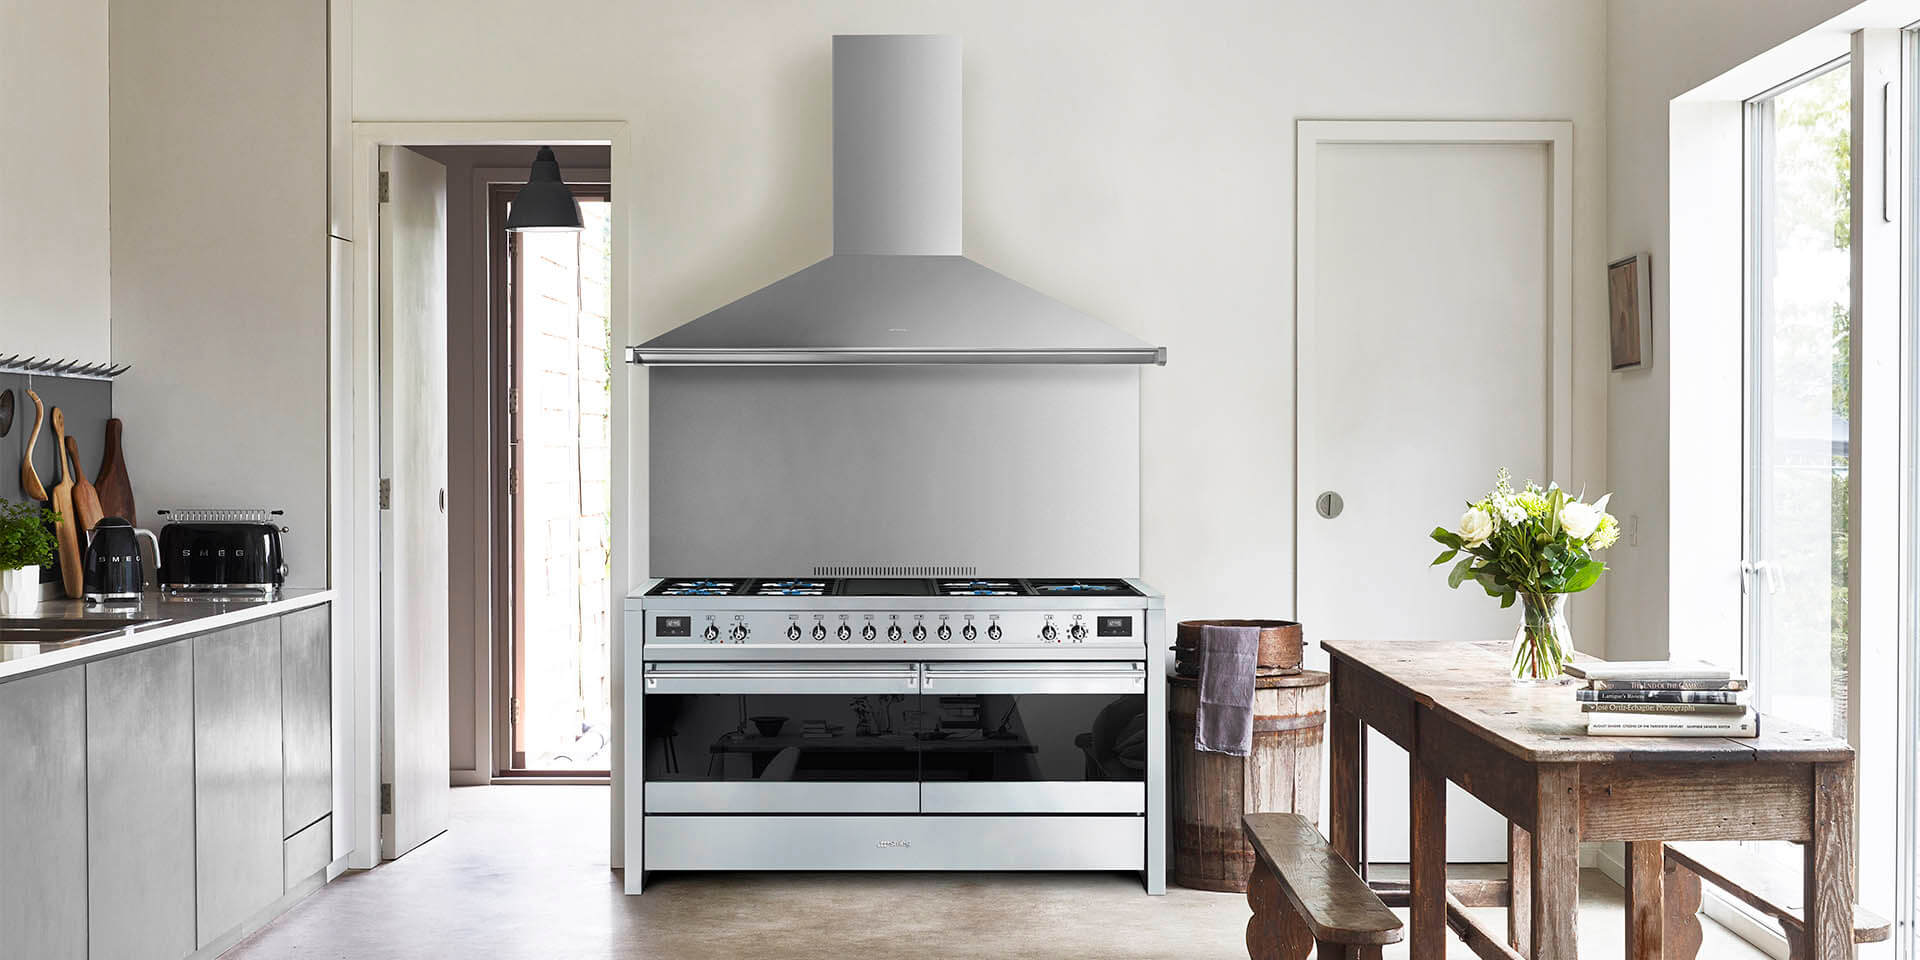 NEW 150cm OPERA A5 cooker